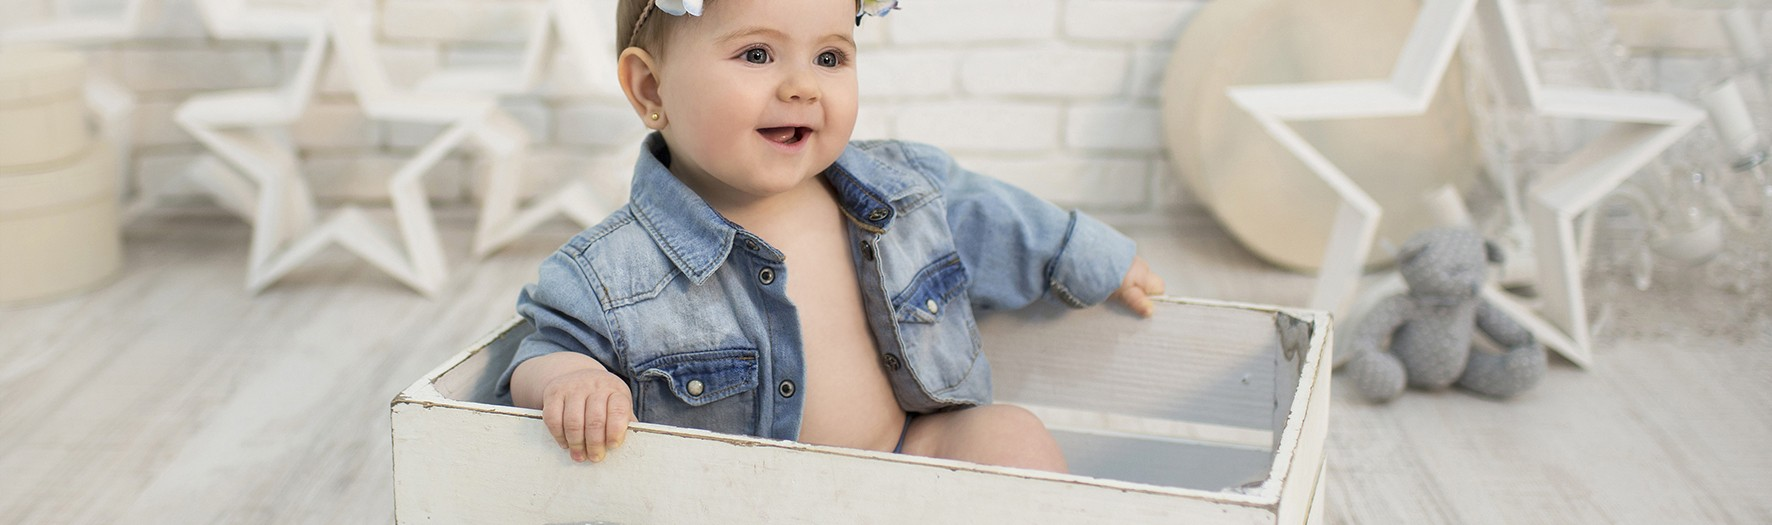 Fotógrafos de niños en Murcia + Fotos de bebés + Andrea + Silvia Ferrer.